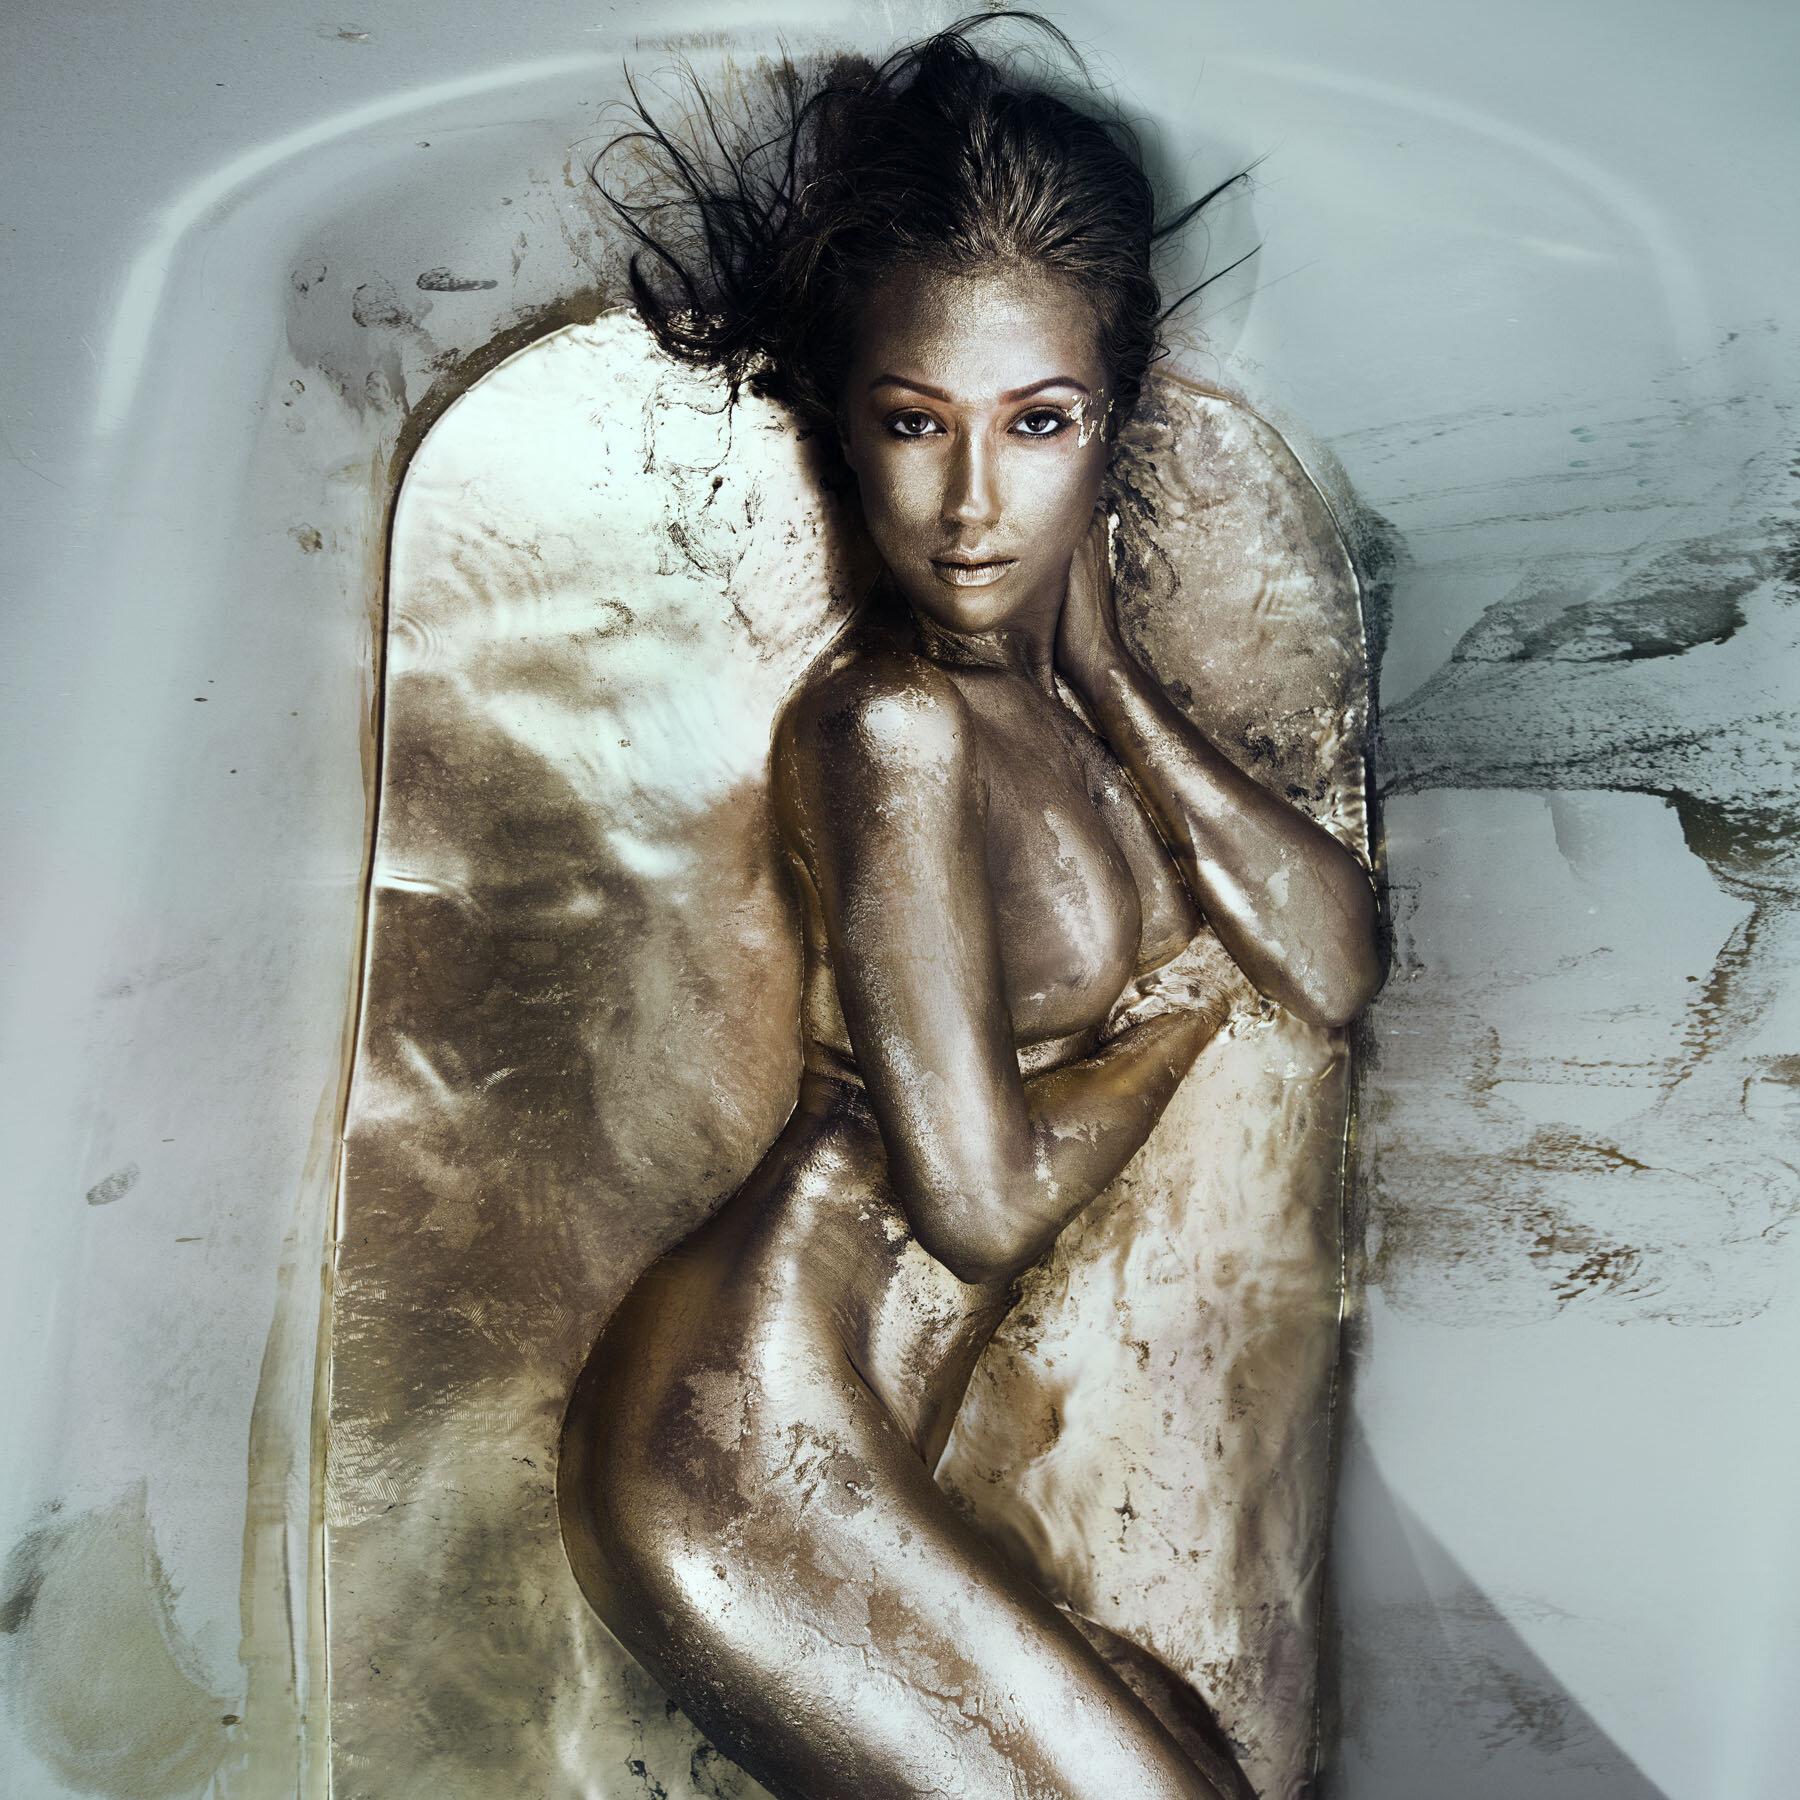 Gold bath aIMG_0347c tint.jpg